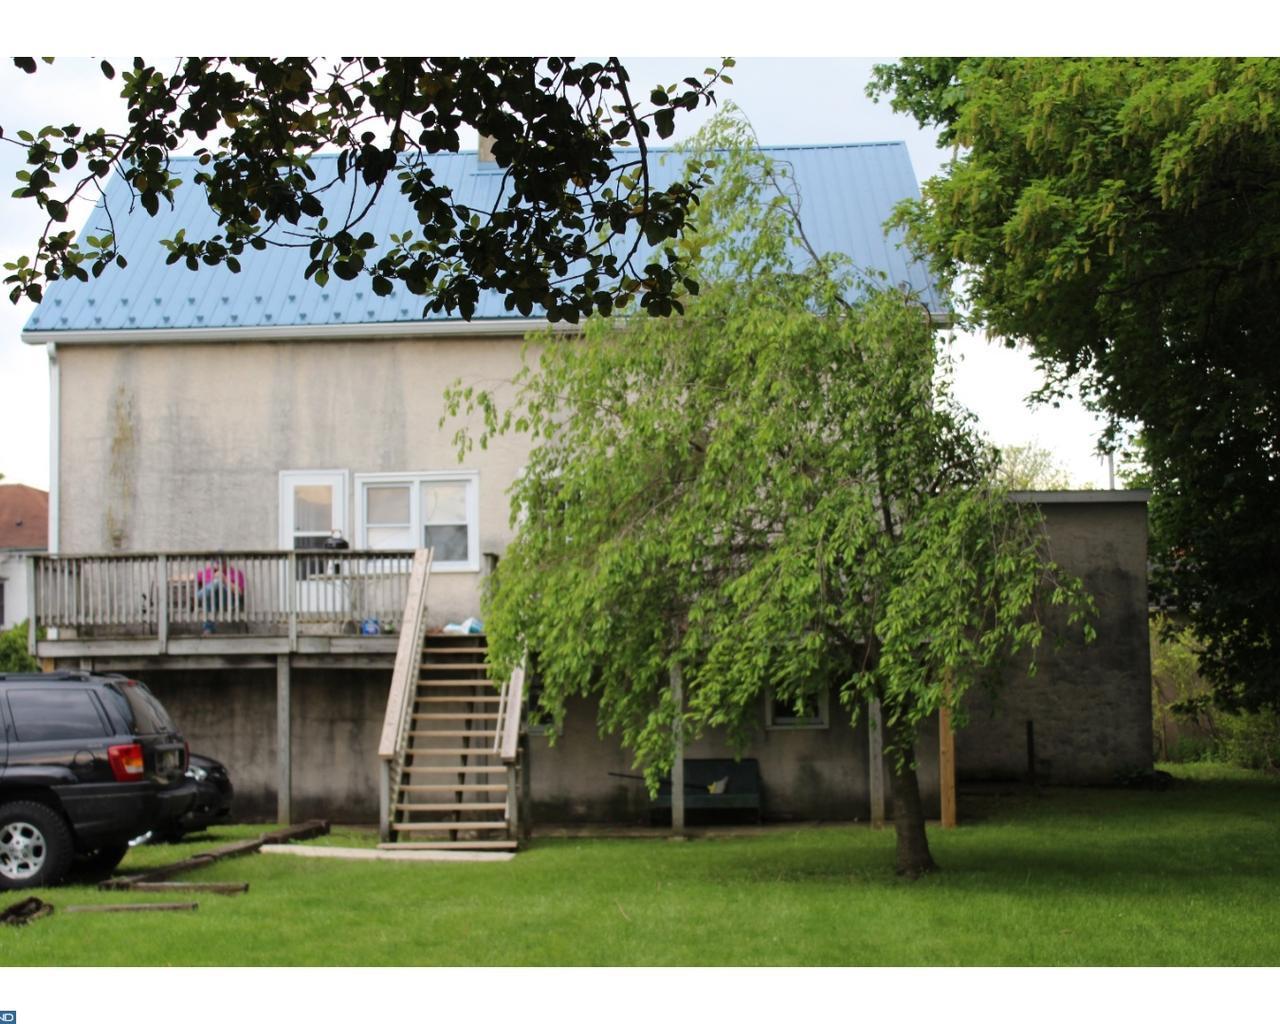 Property for sale at 749 VINE ST, Honey Brook,  PA 19344